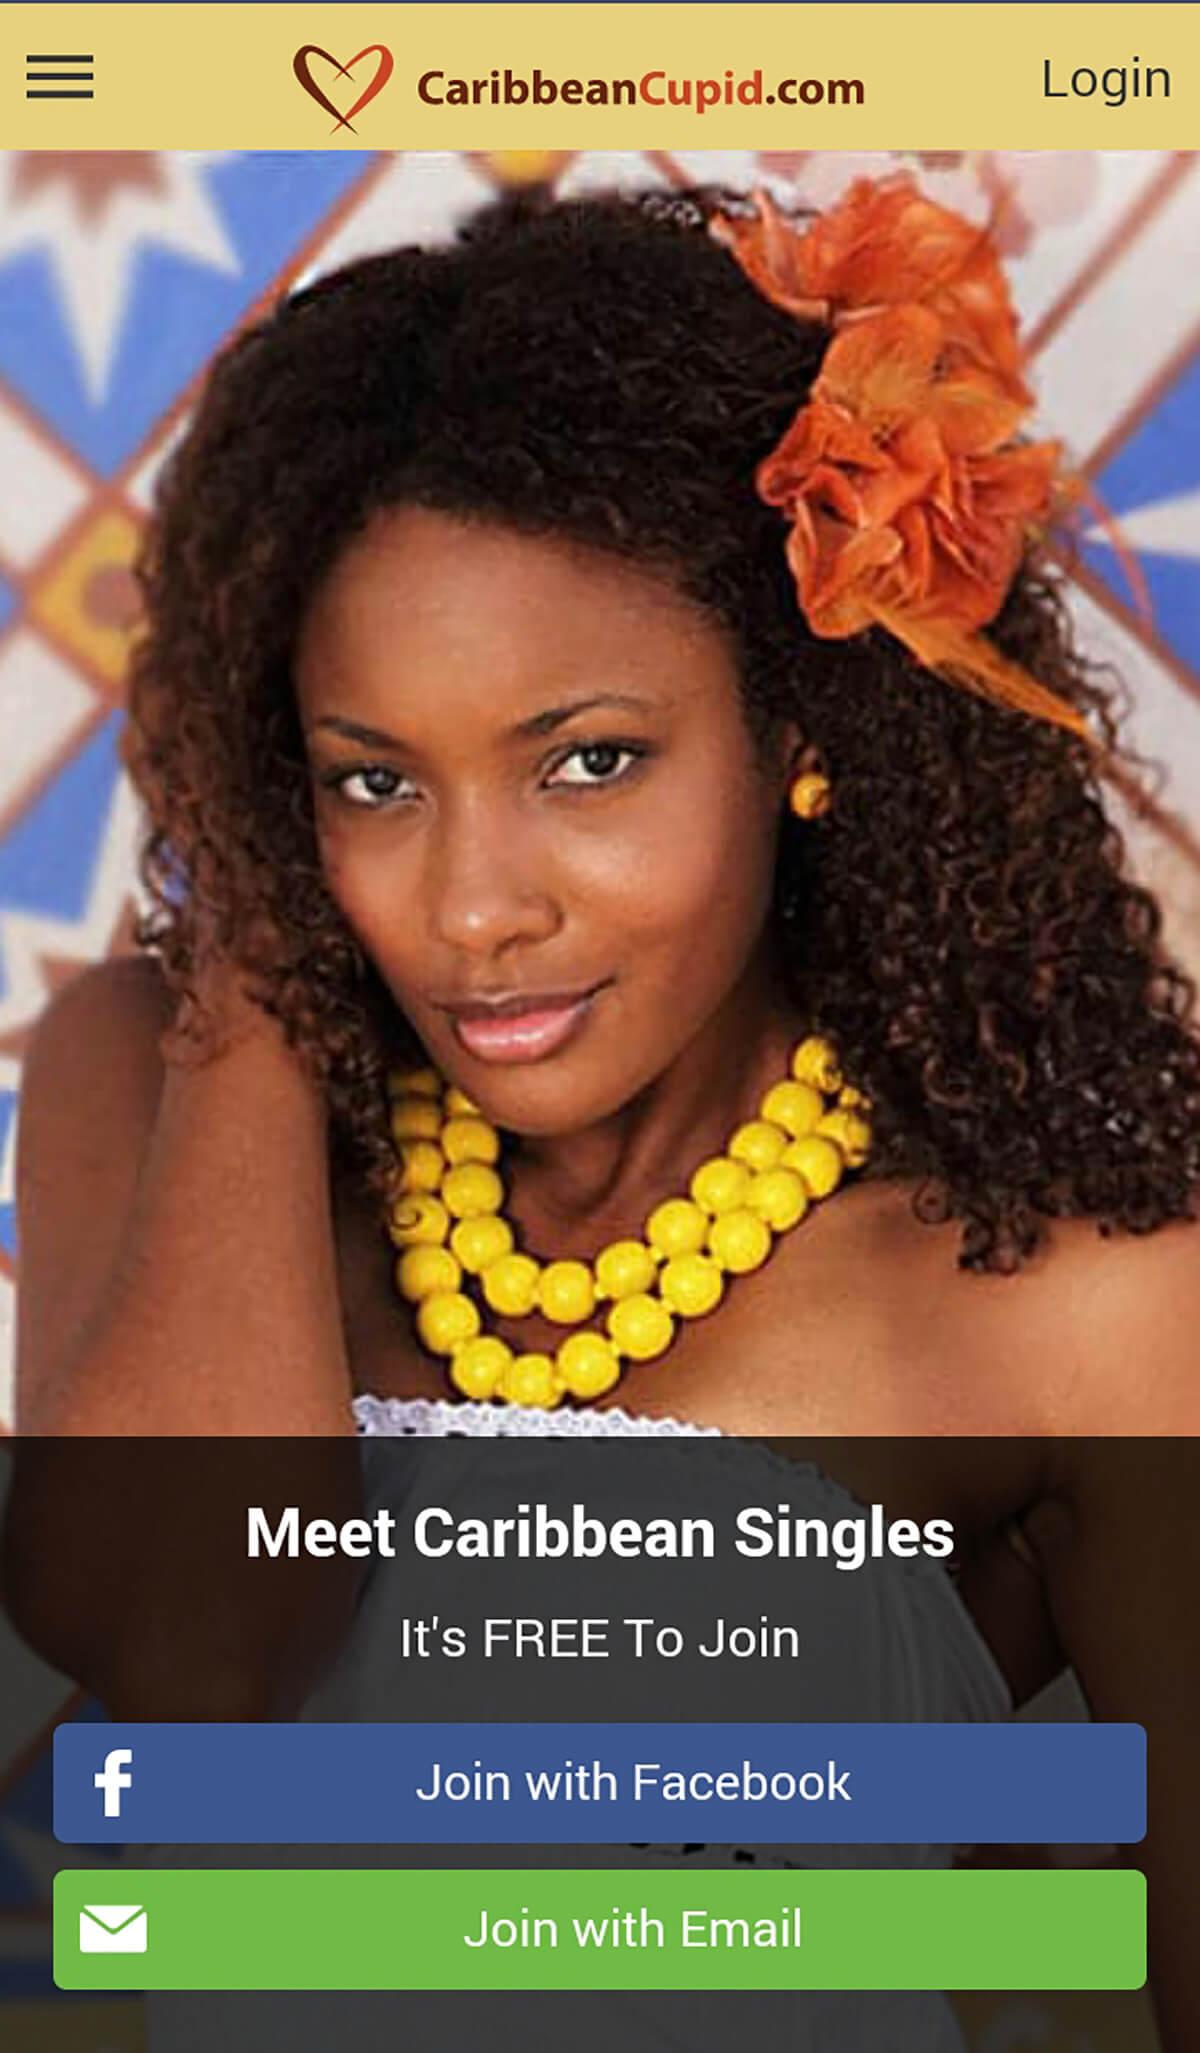 caribbeancupid com dating